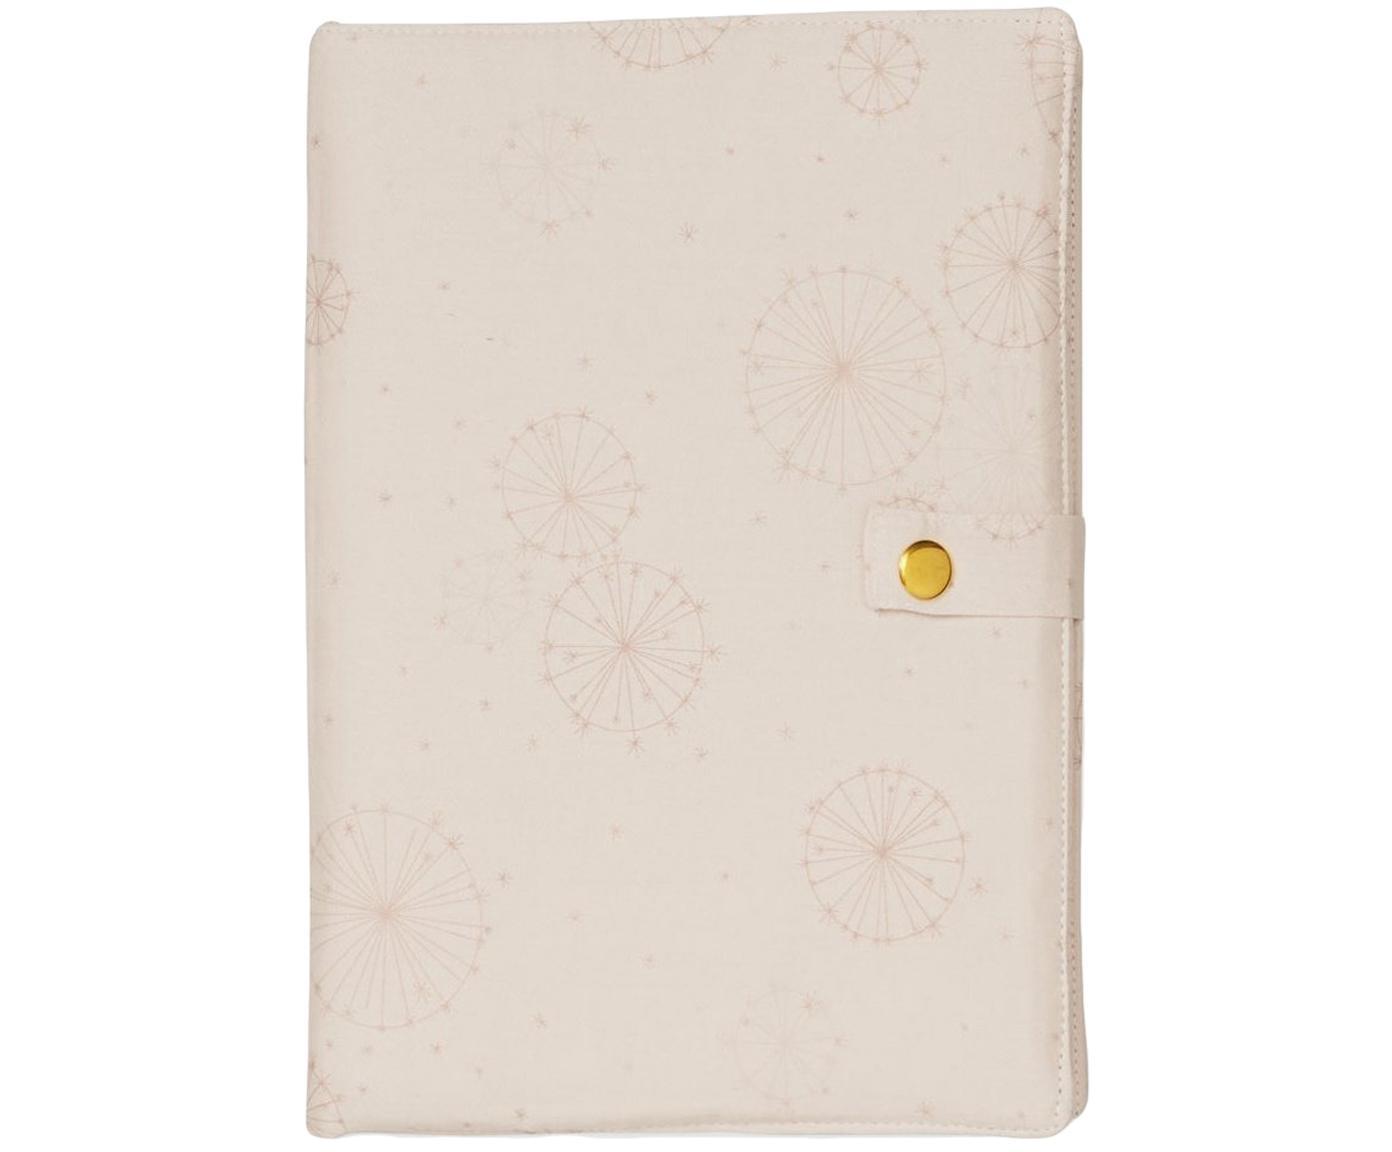 U-Heft-Hülle Dandelion aus Bio-Baumwolle, Bio-Baumwolle, OCS-zertifiziert, Rosa, 17 x 24 cm